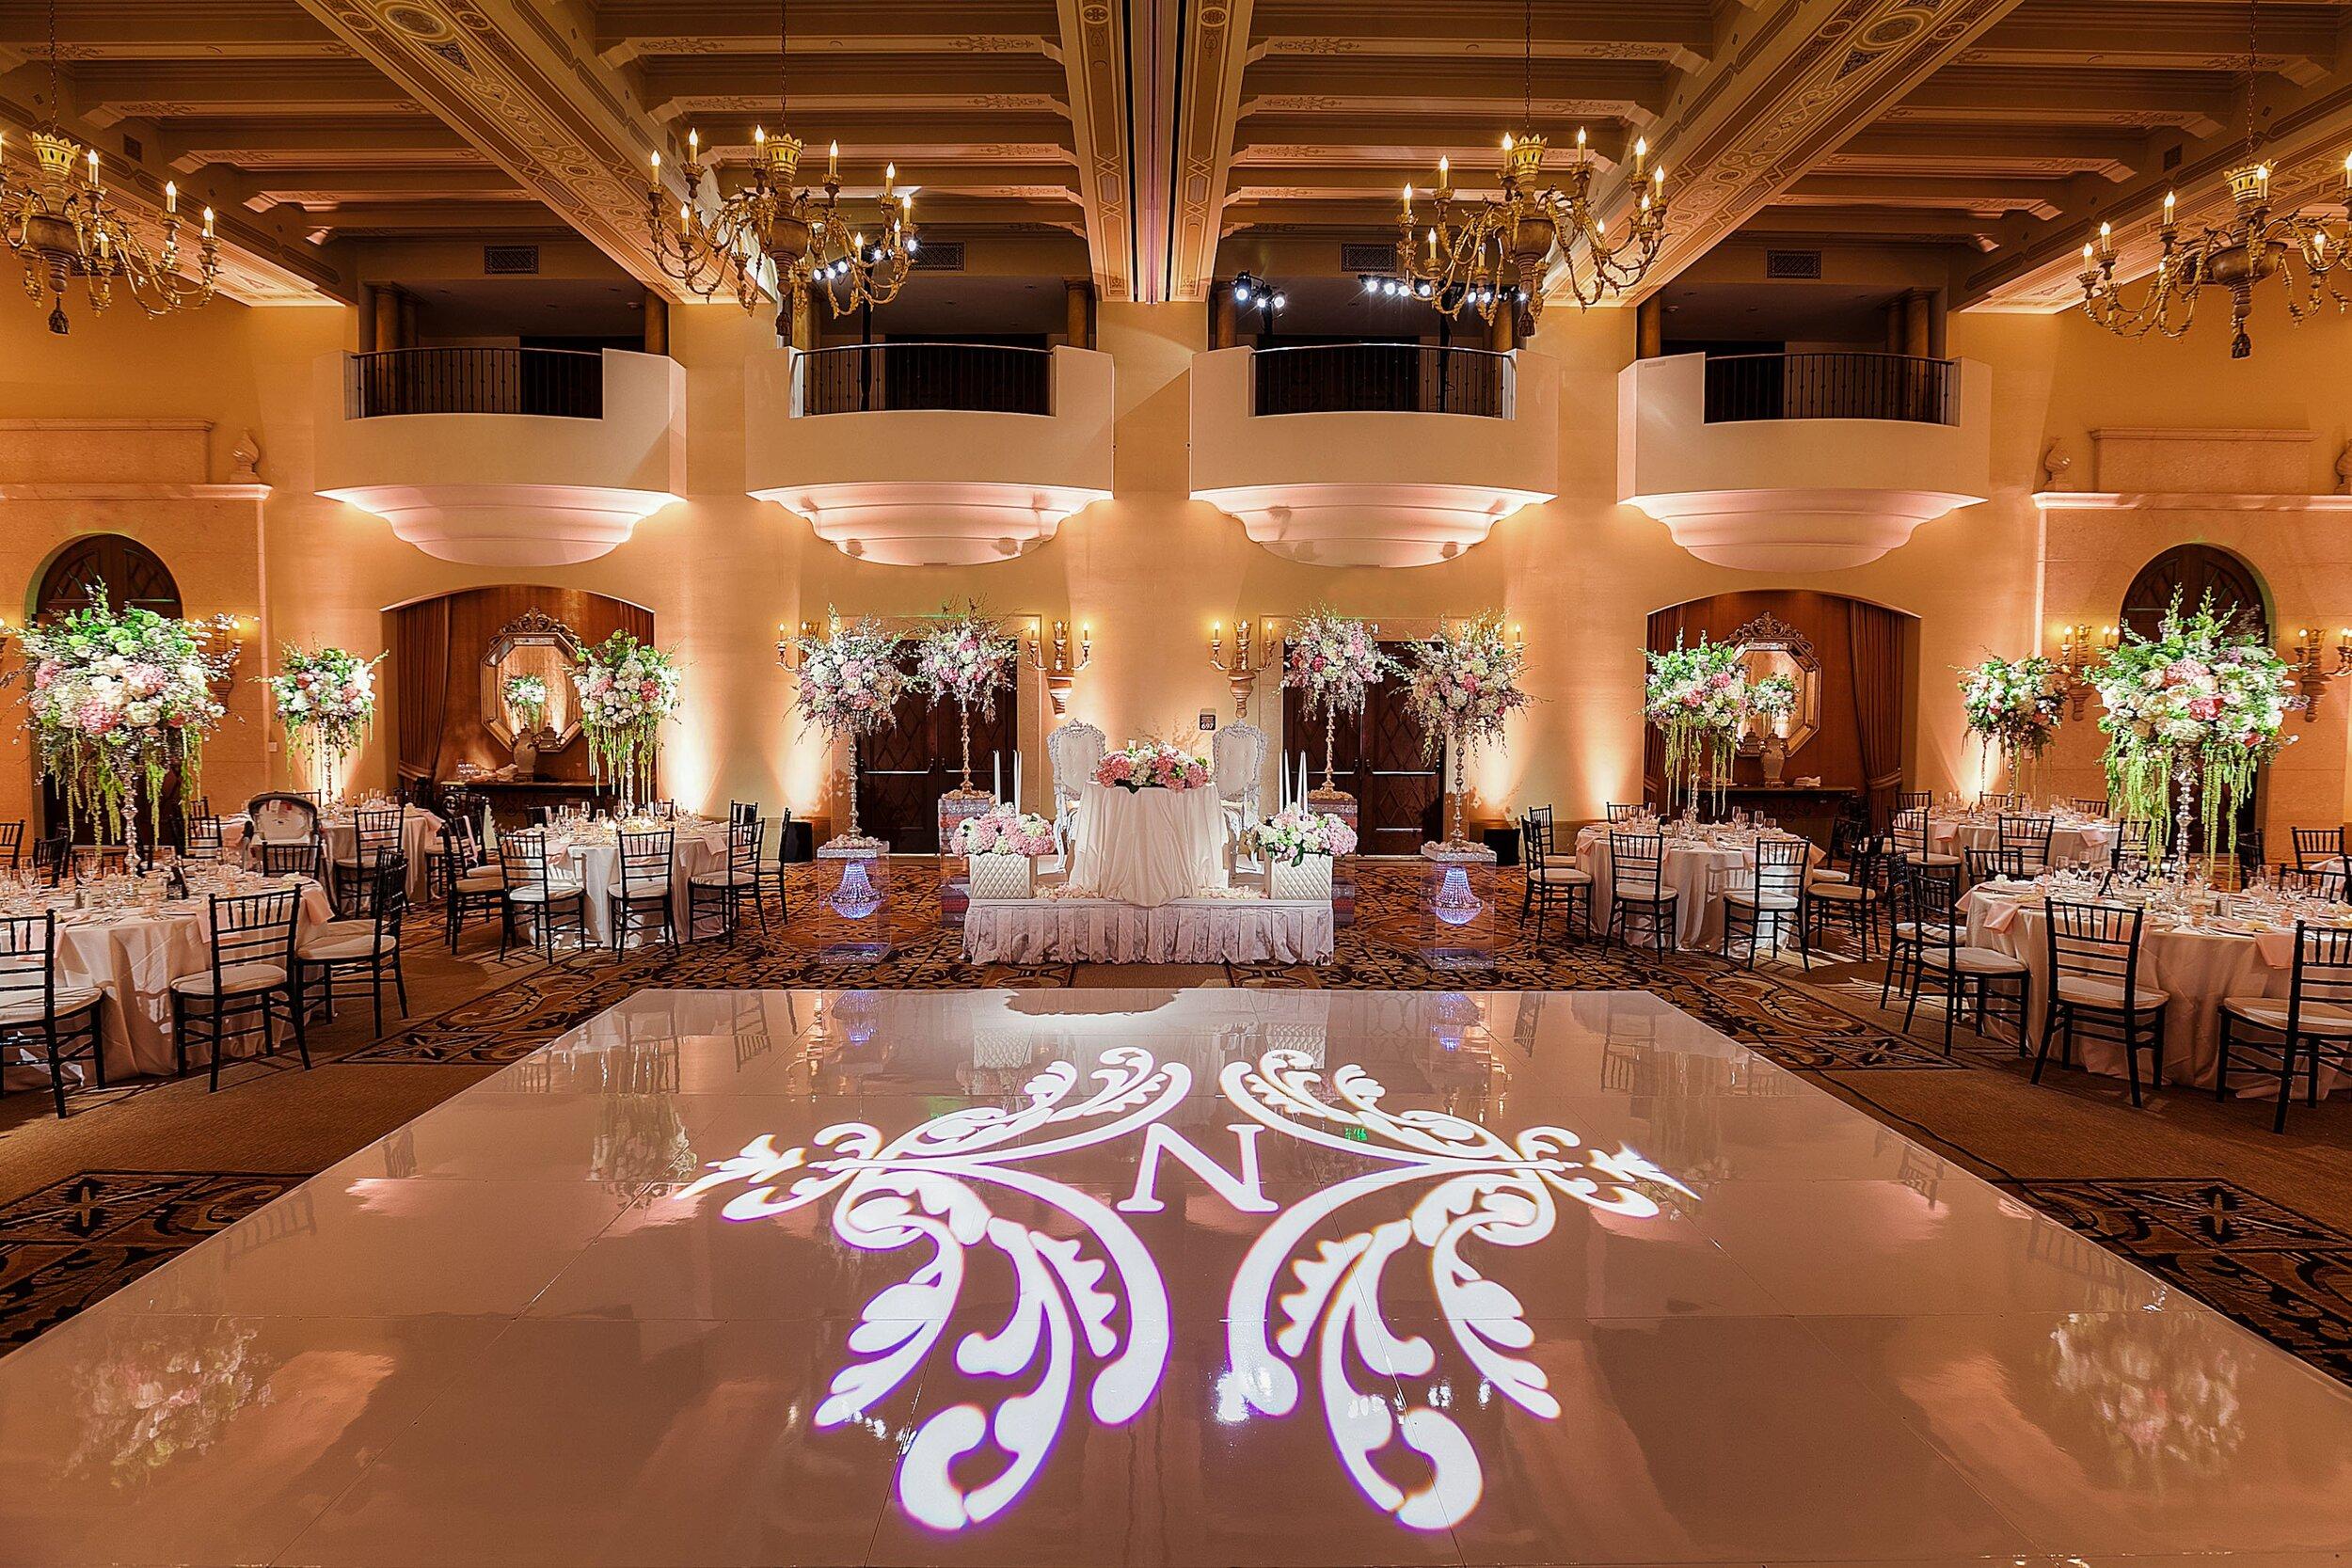 Custom Monogram For Wedding and Event